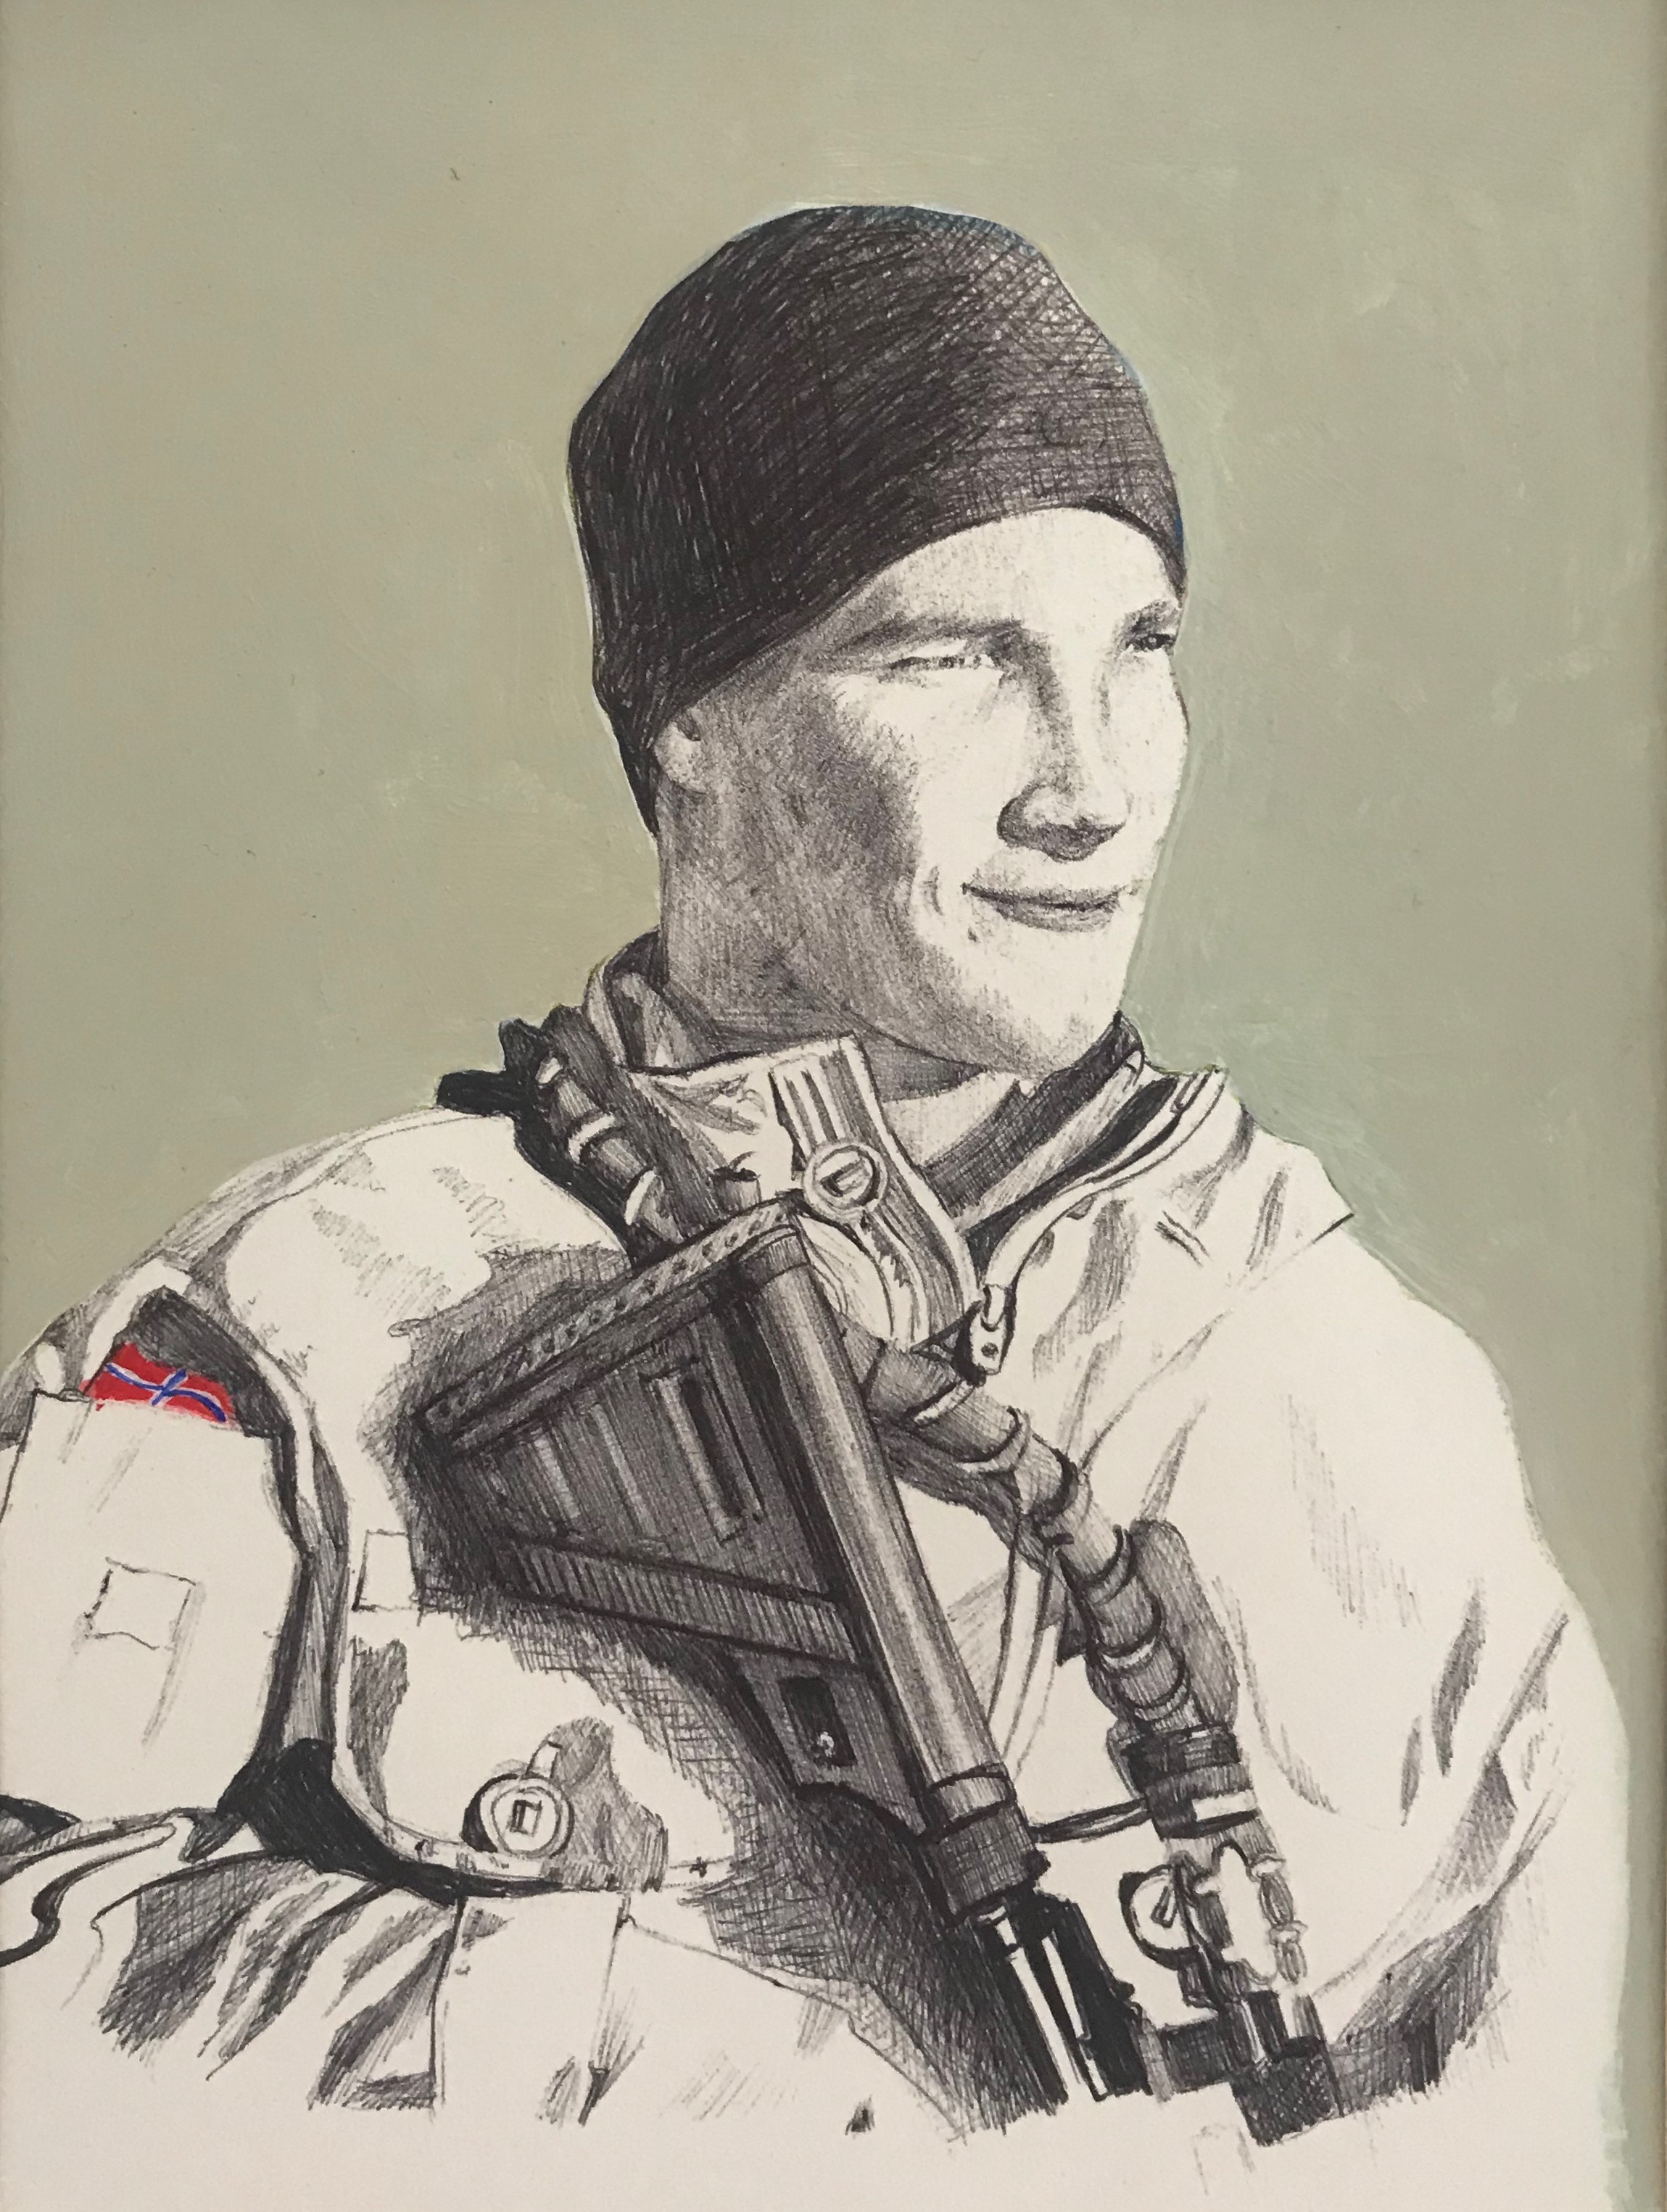 Soldier, pen & ink & acrylic on paper, 12 cm x 17 cm